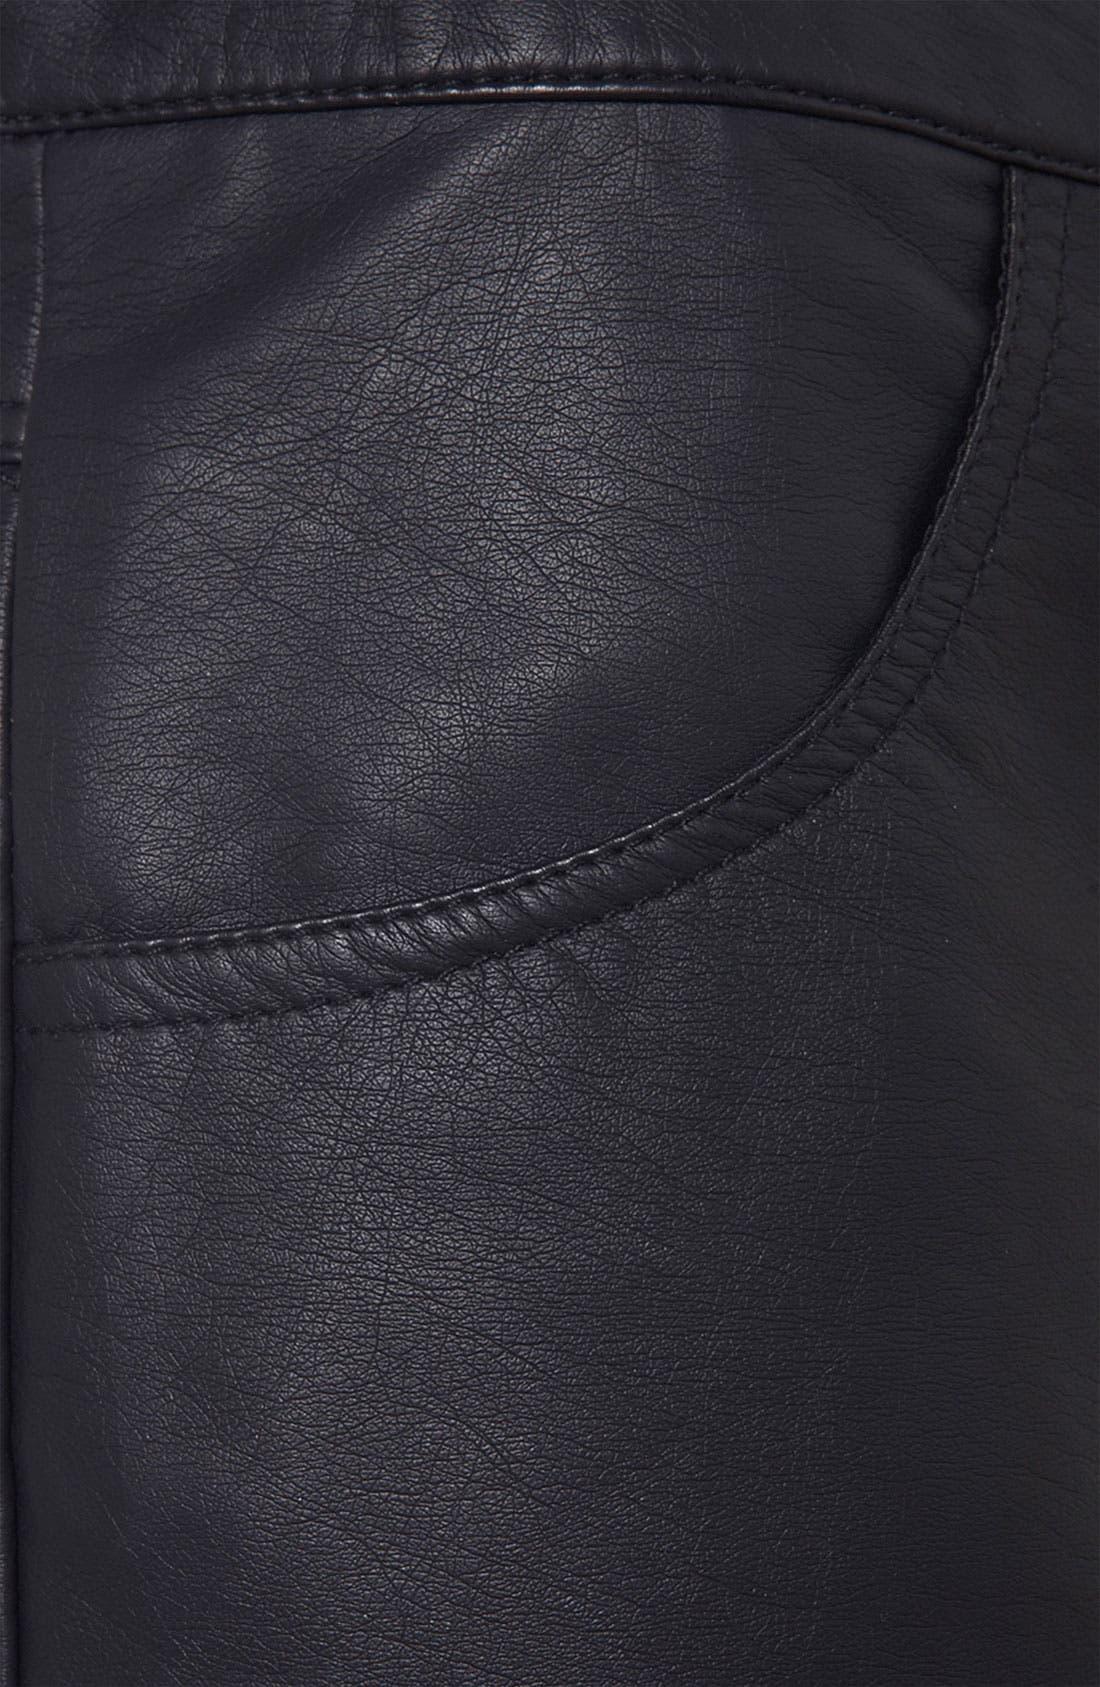 Faux Leather Shorts,                             Alternate thumbnail 2, color,                             001